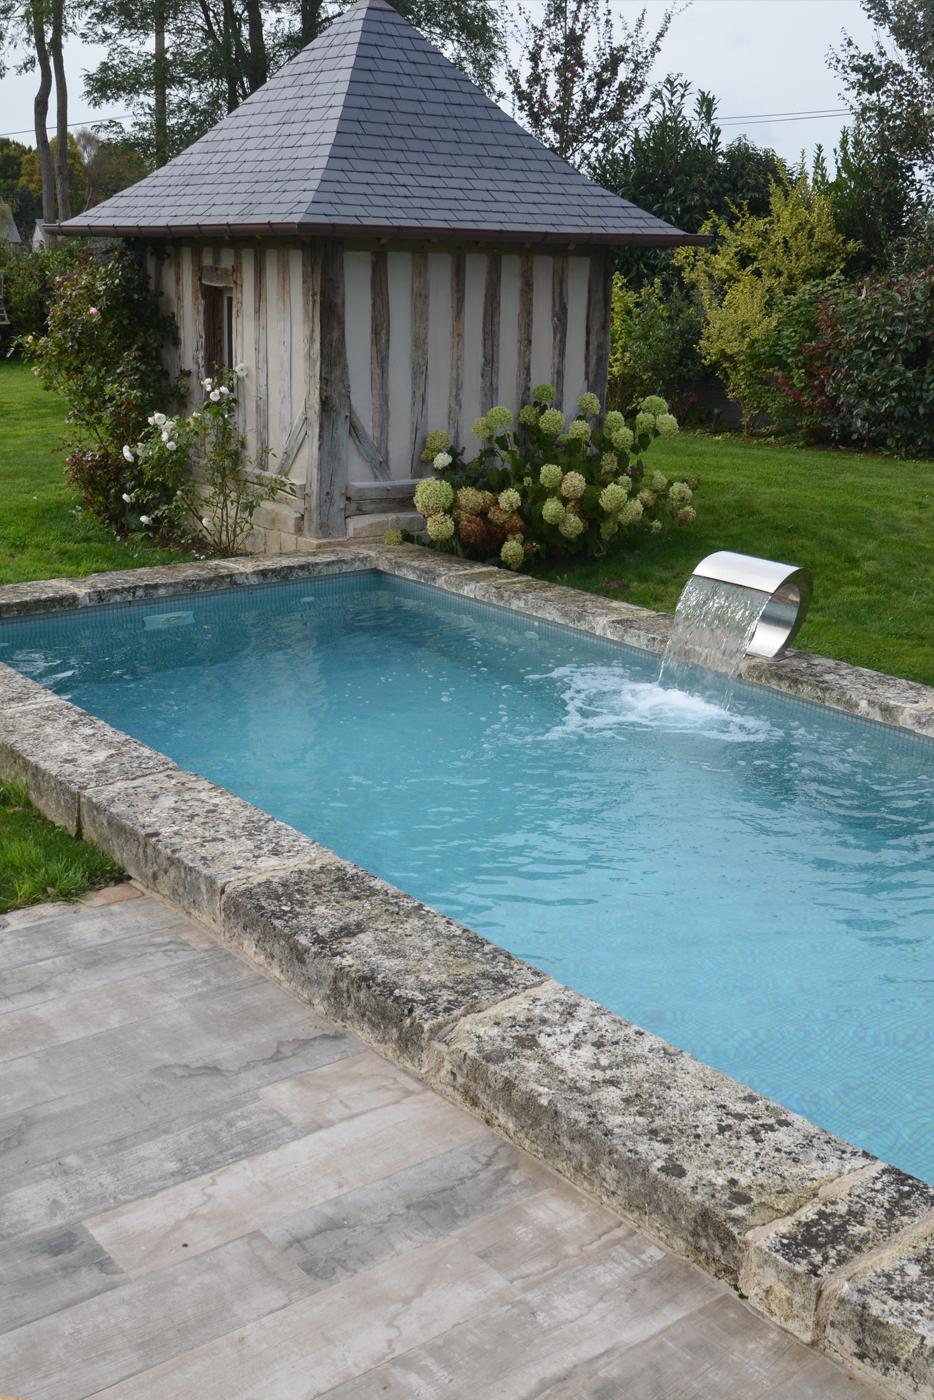 Mini Piscine Petit Jardin la mini piscine : petite par la taille, grande par l